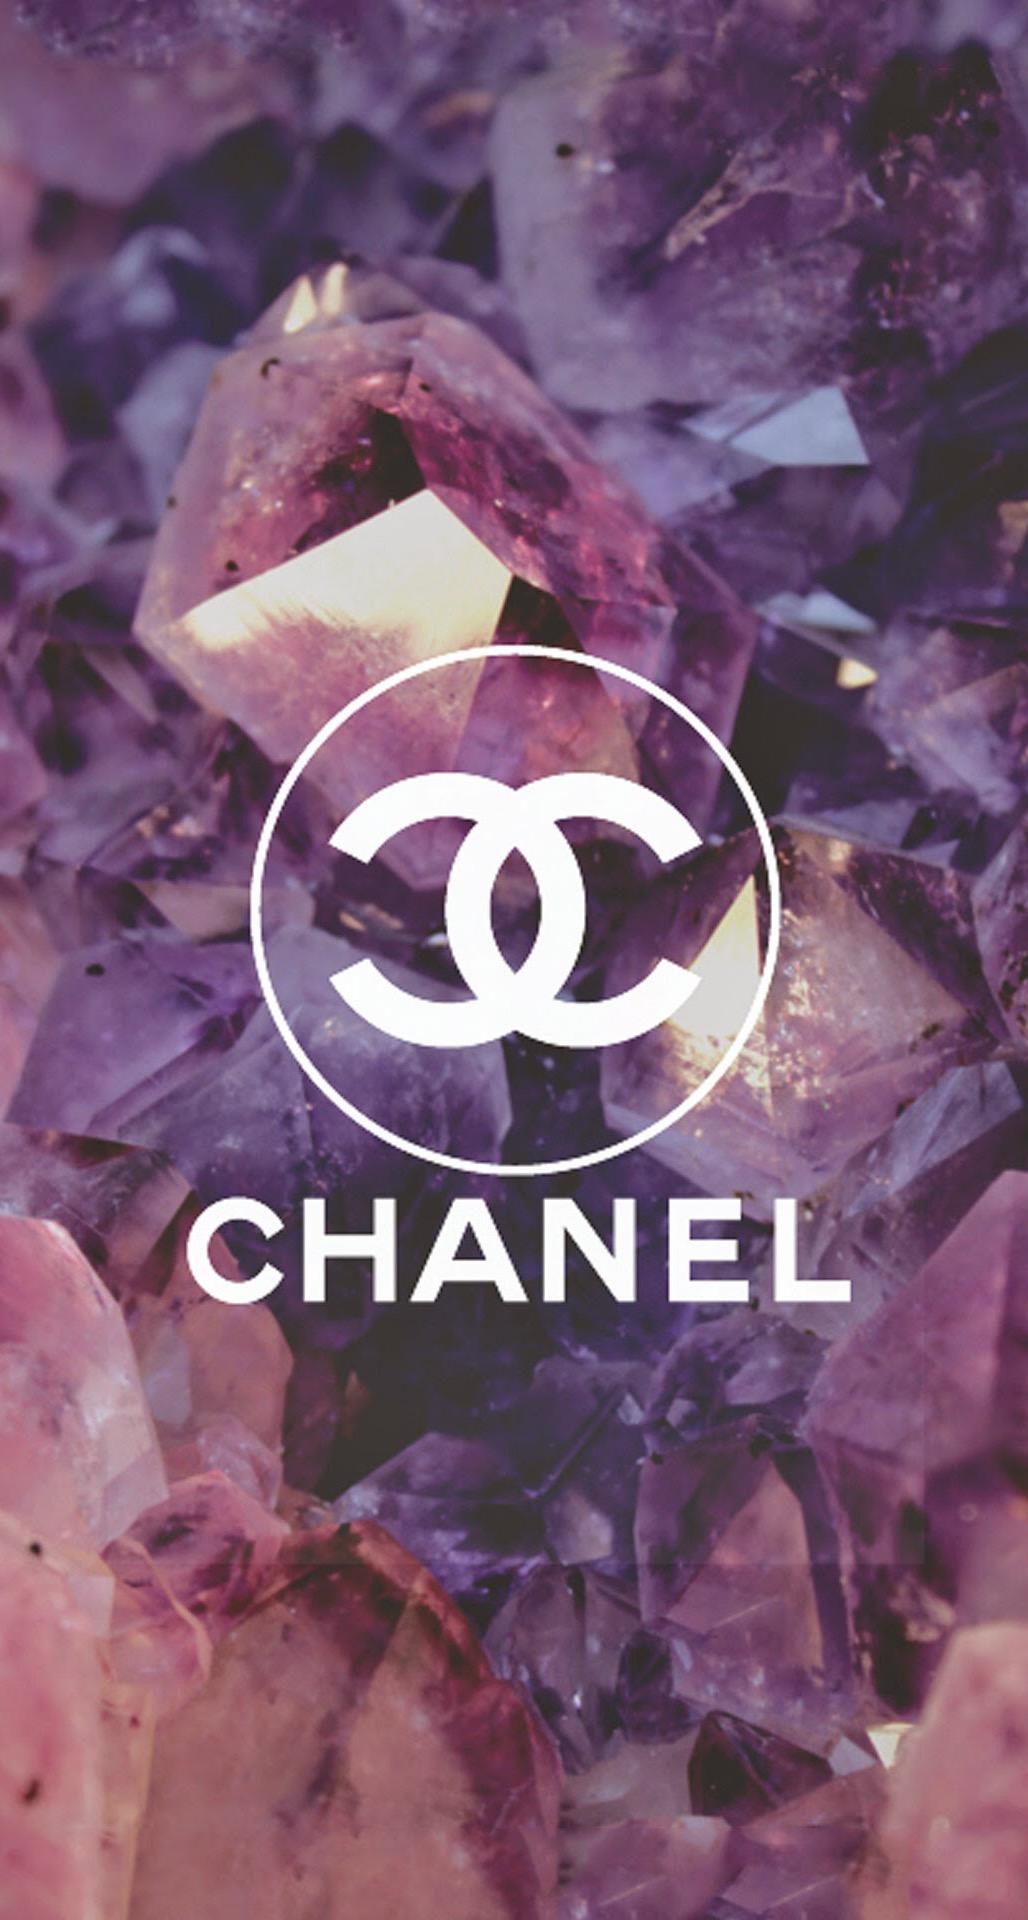 Coco Chanel Logo Diamonds iPhone 6 Plus HD Wallpaper iPod Wallpaper 1028x1920